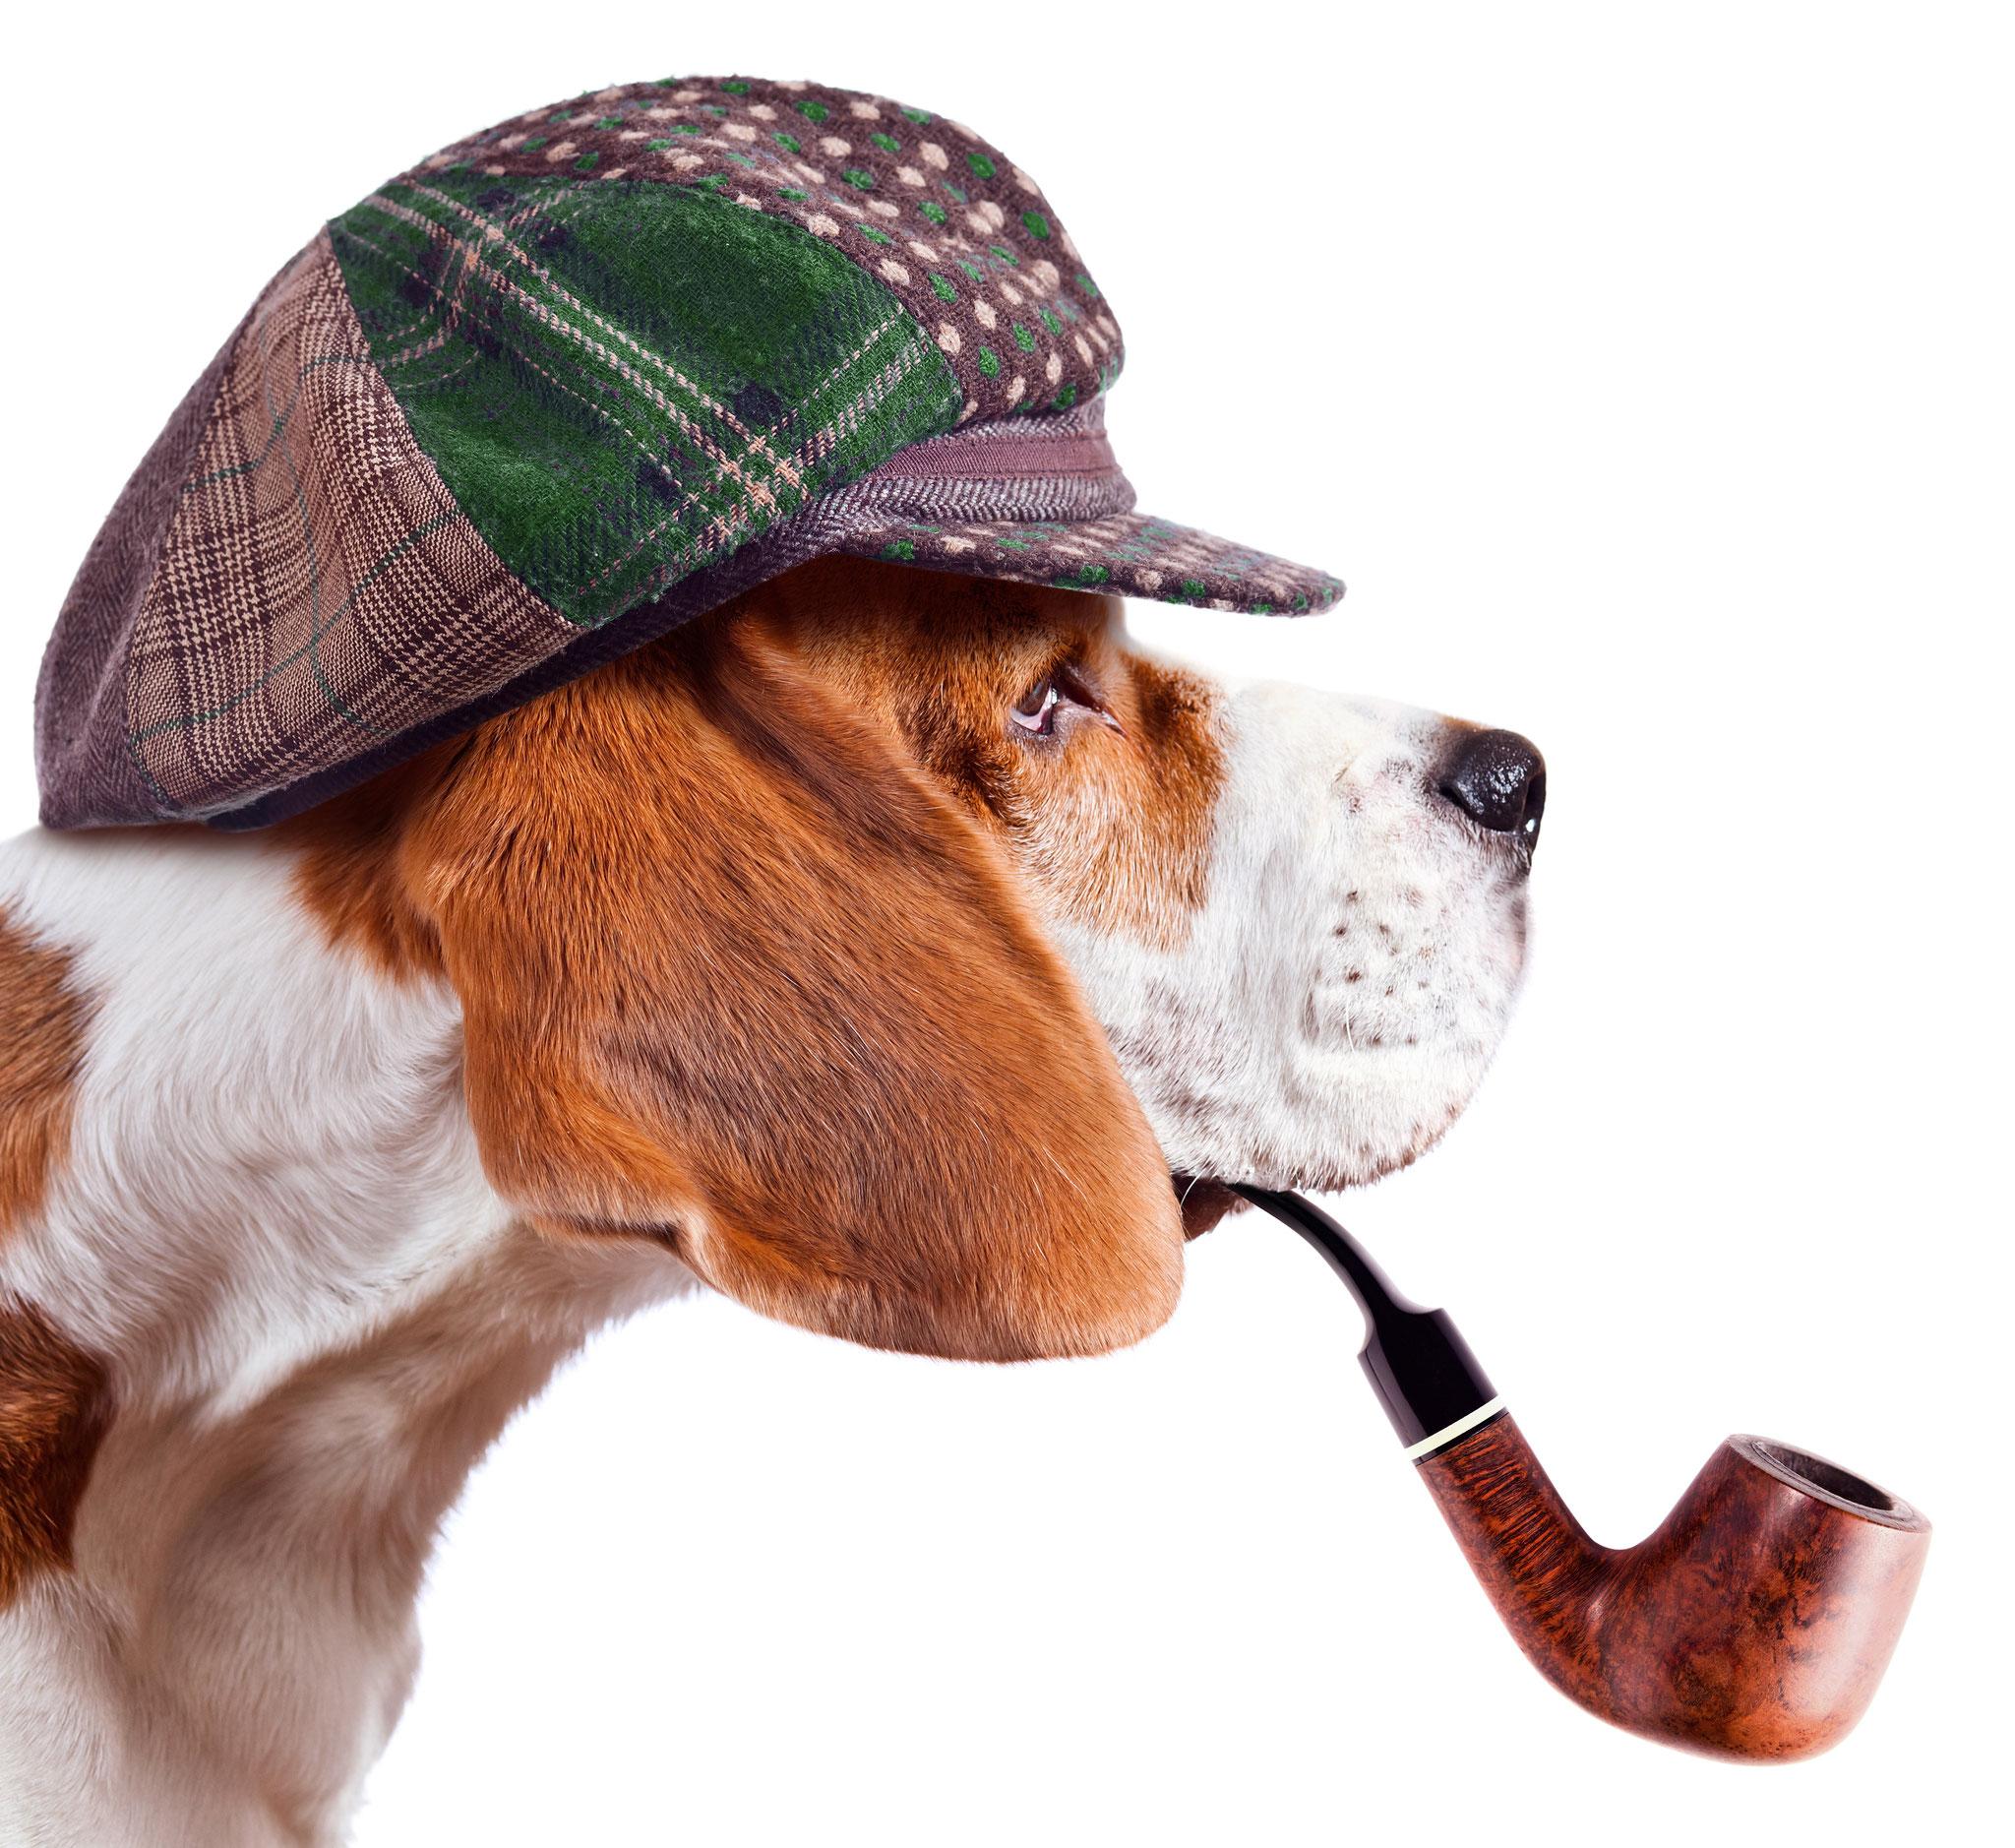 Sa, 21.08. | 10.00-13.00 Uhr: Krimitour mit Hund durch Kaulsdorf | © Igor Normann, Adobe Stock